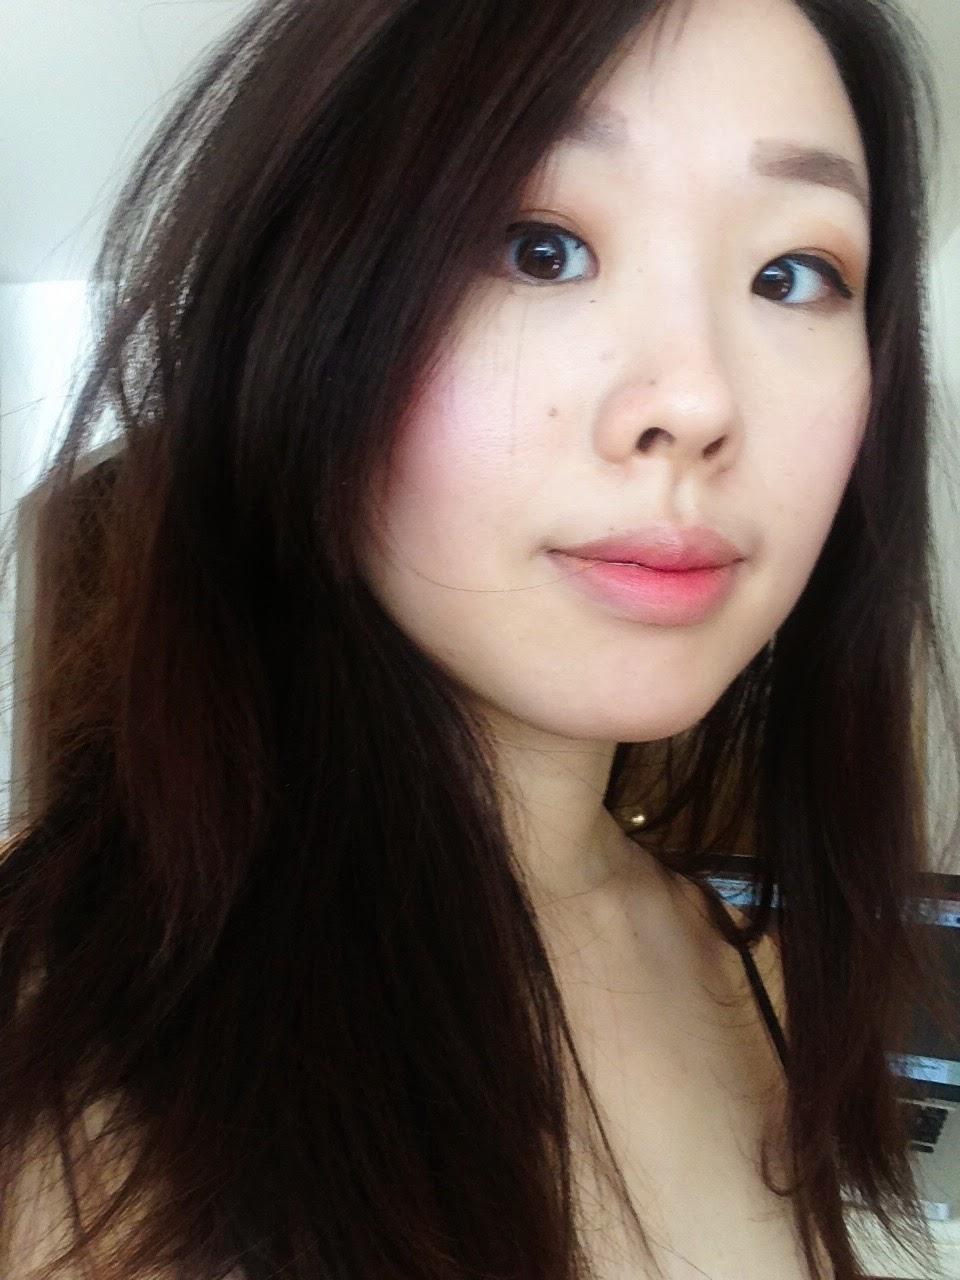 kinseng: Korean Makeup Look Using Inexpensive American ...